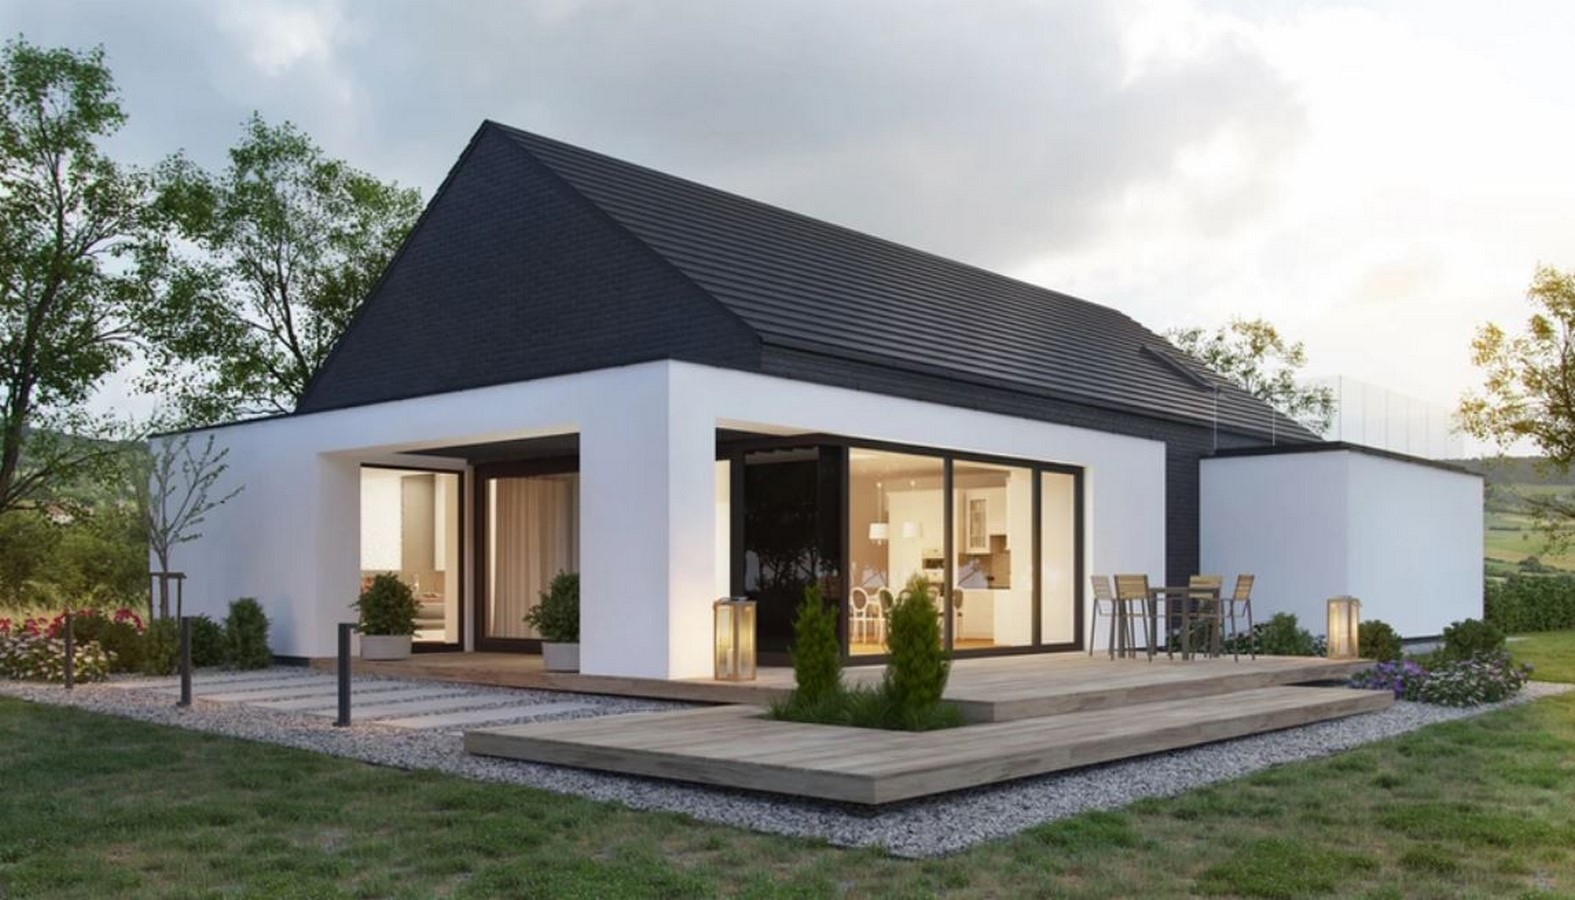 Architects in Krakow - Top 100 Architects in Krakow: Sheet 8